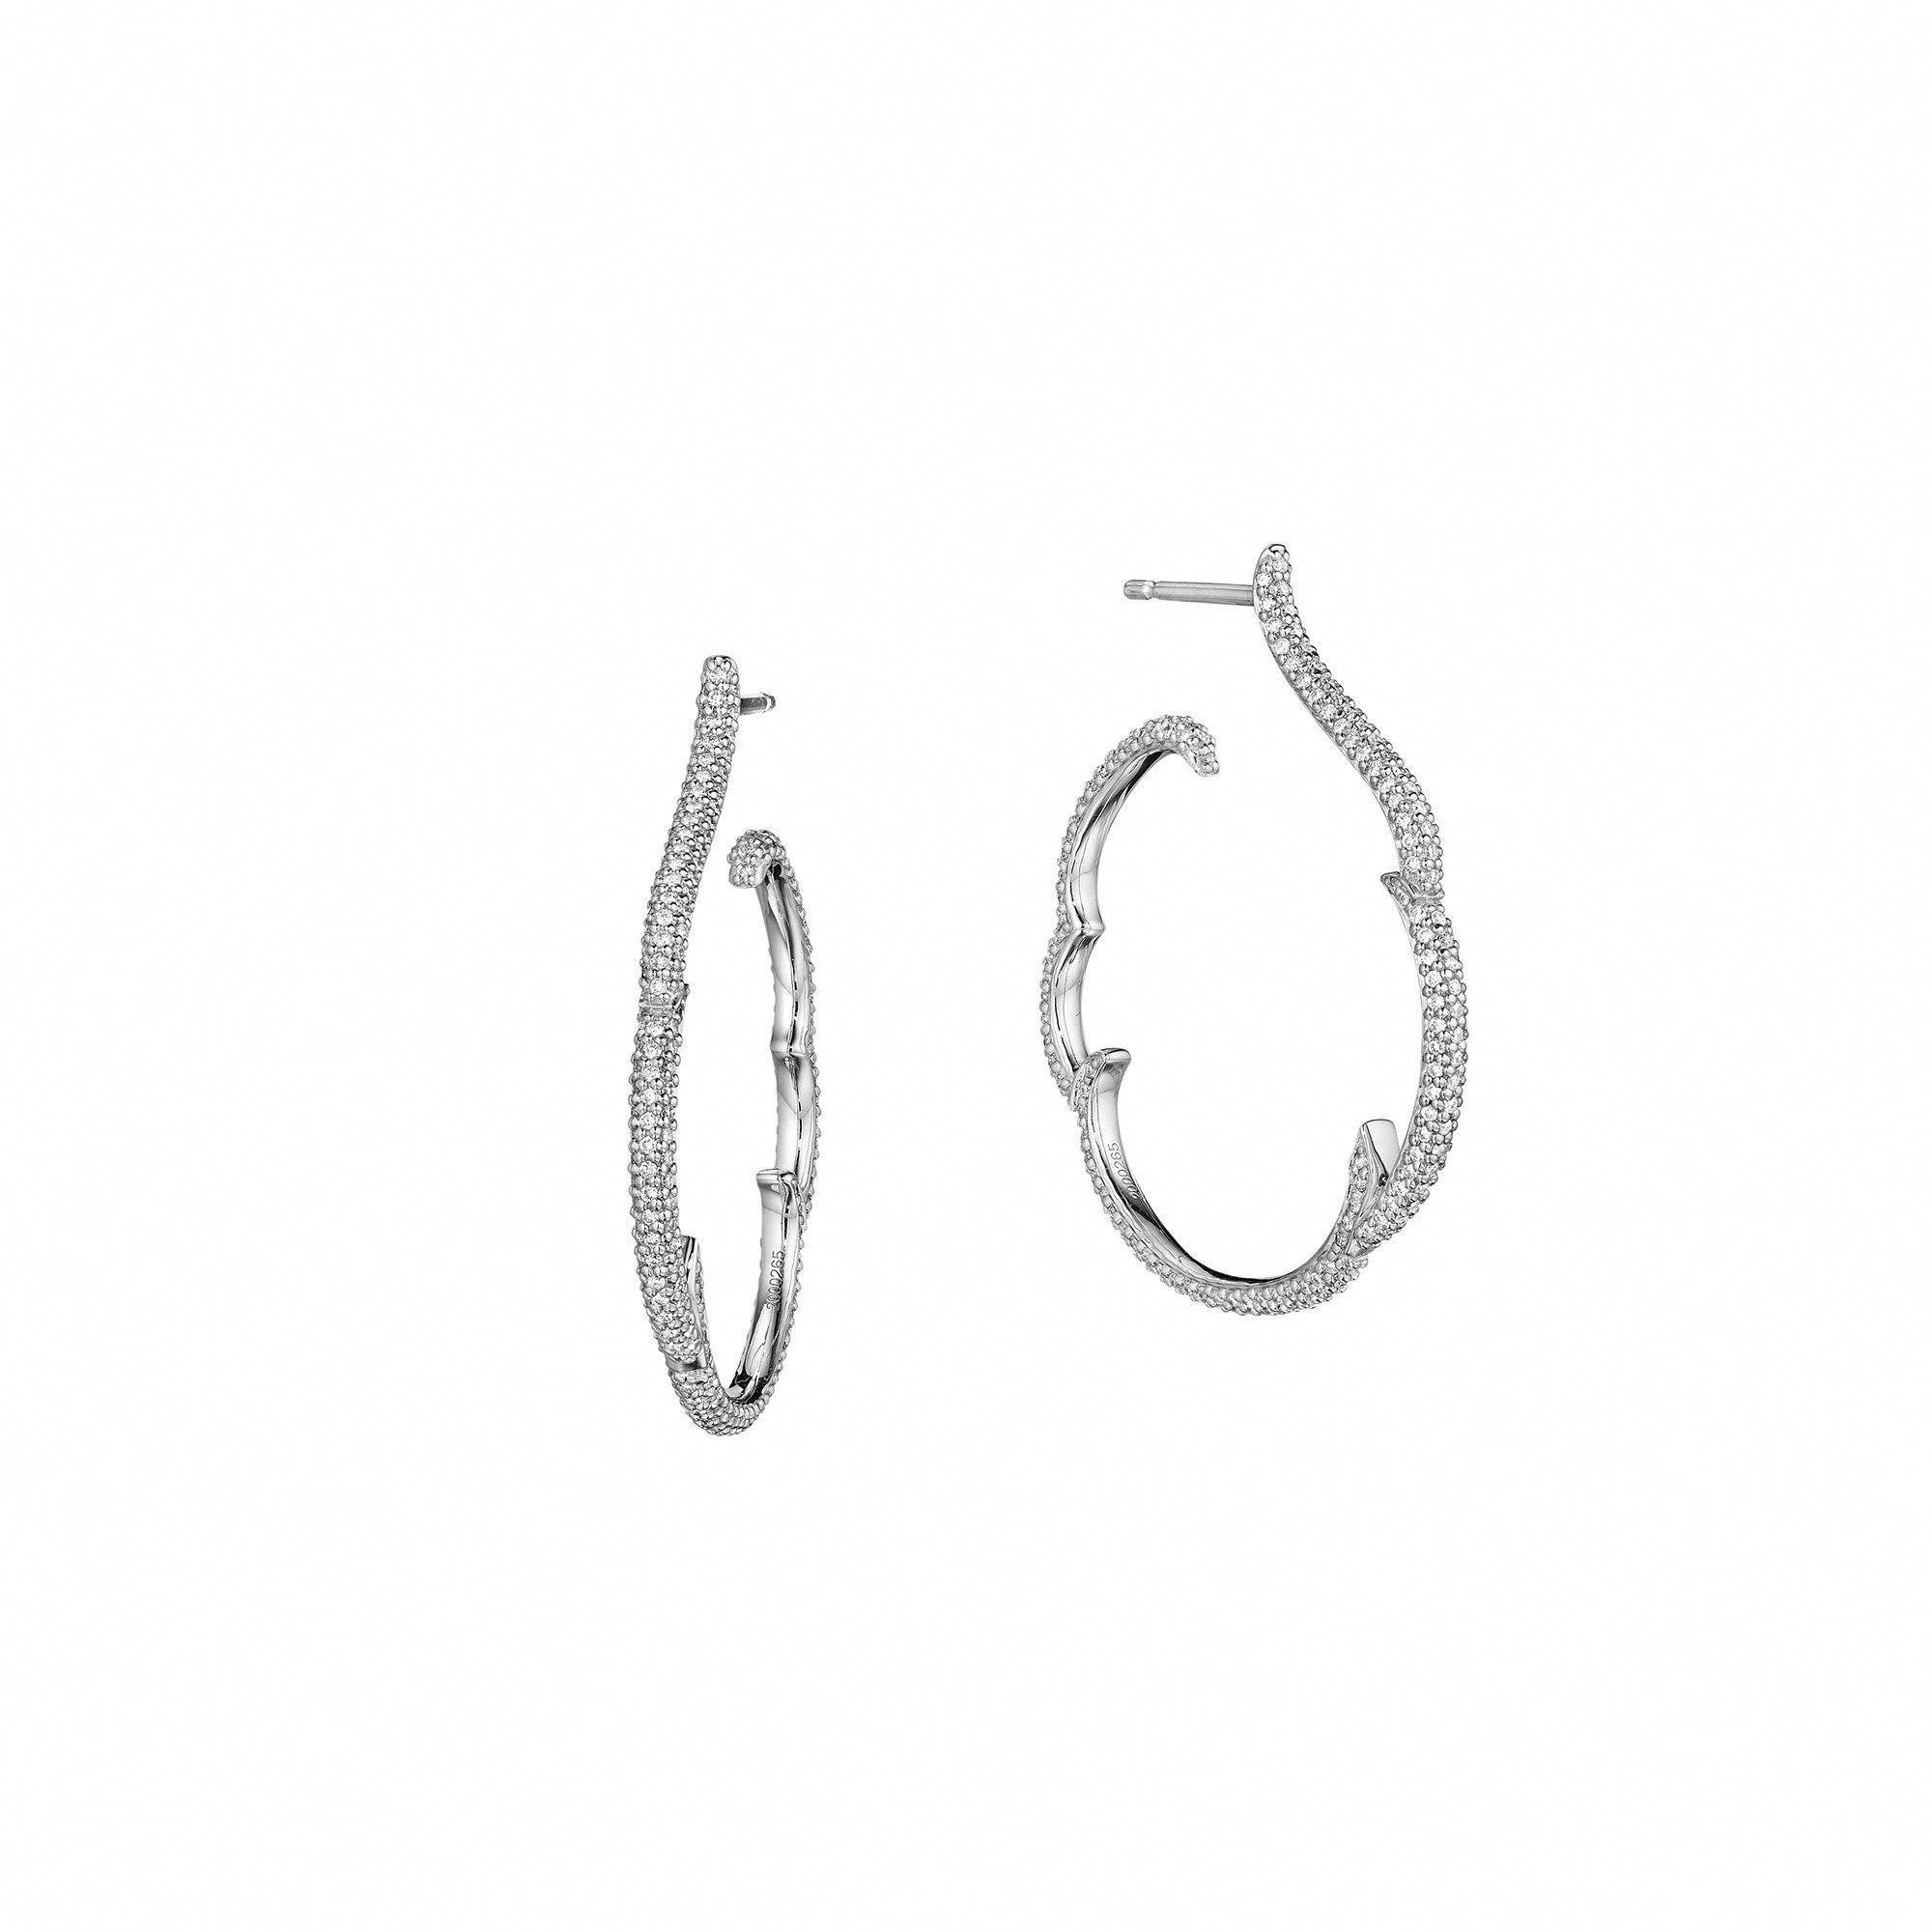 Piercing jewellery names  ZoZo Pave Diamond Hoops Earrings diamondhoopearrings  Jewelry